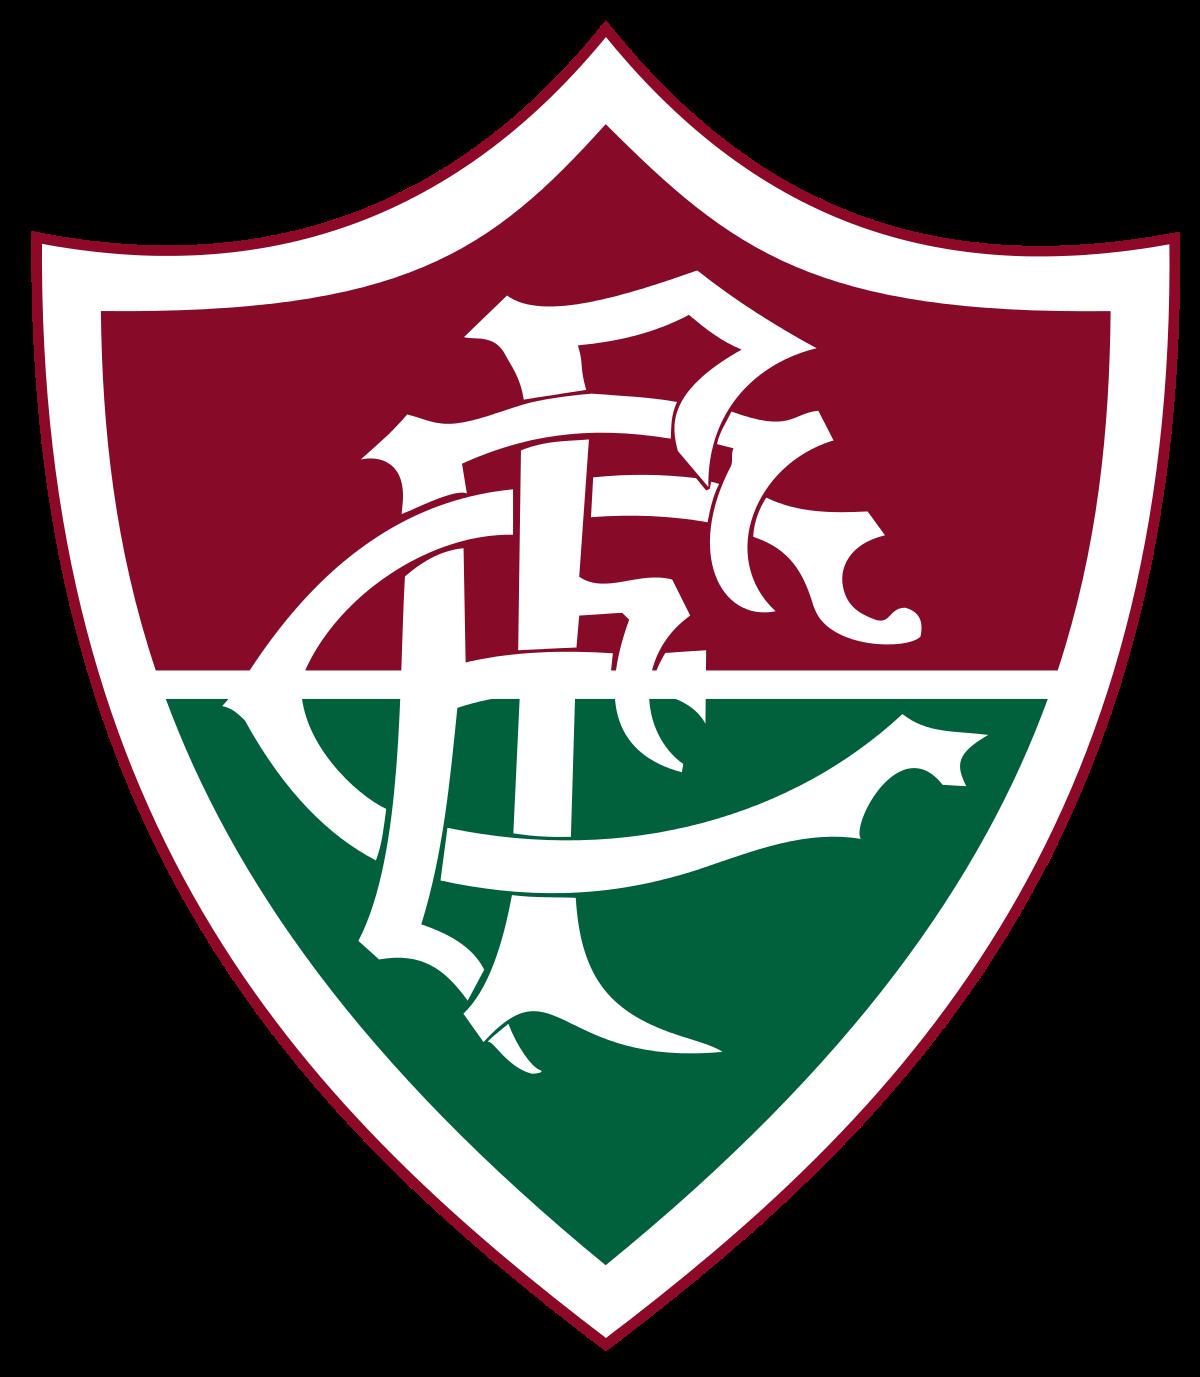 fluminense logo escudo 2 - Fluminense FC Logo